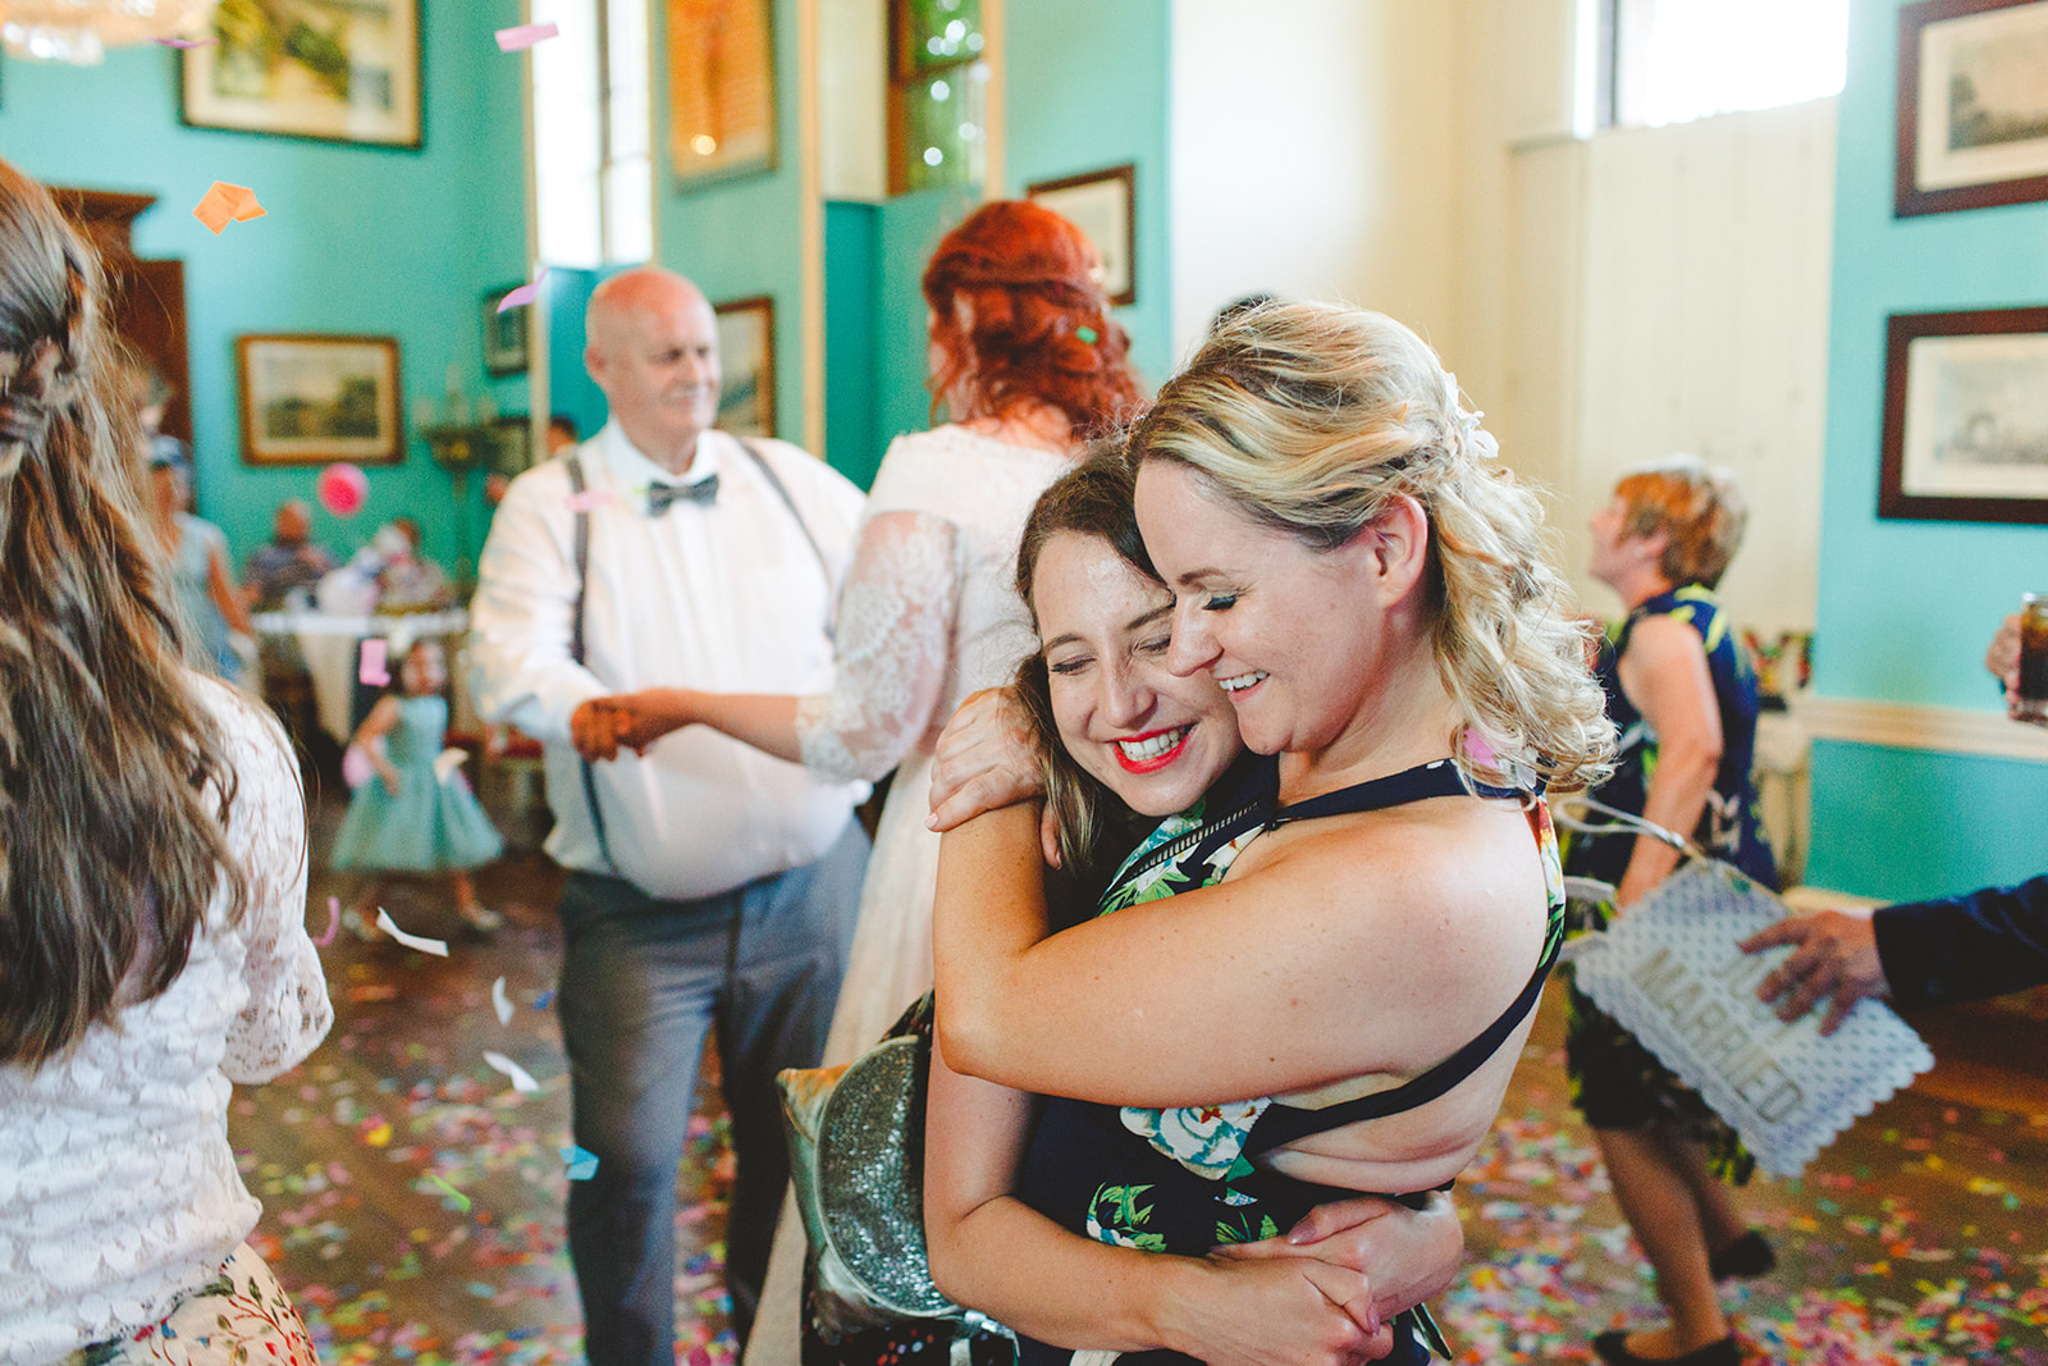 derbyshire-wedding-photographer-videographer-camera-hannah-58.jpg